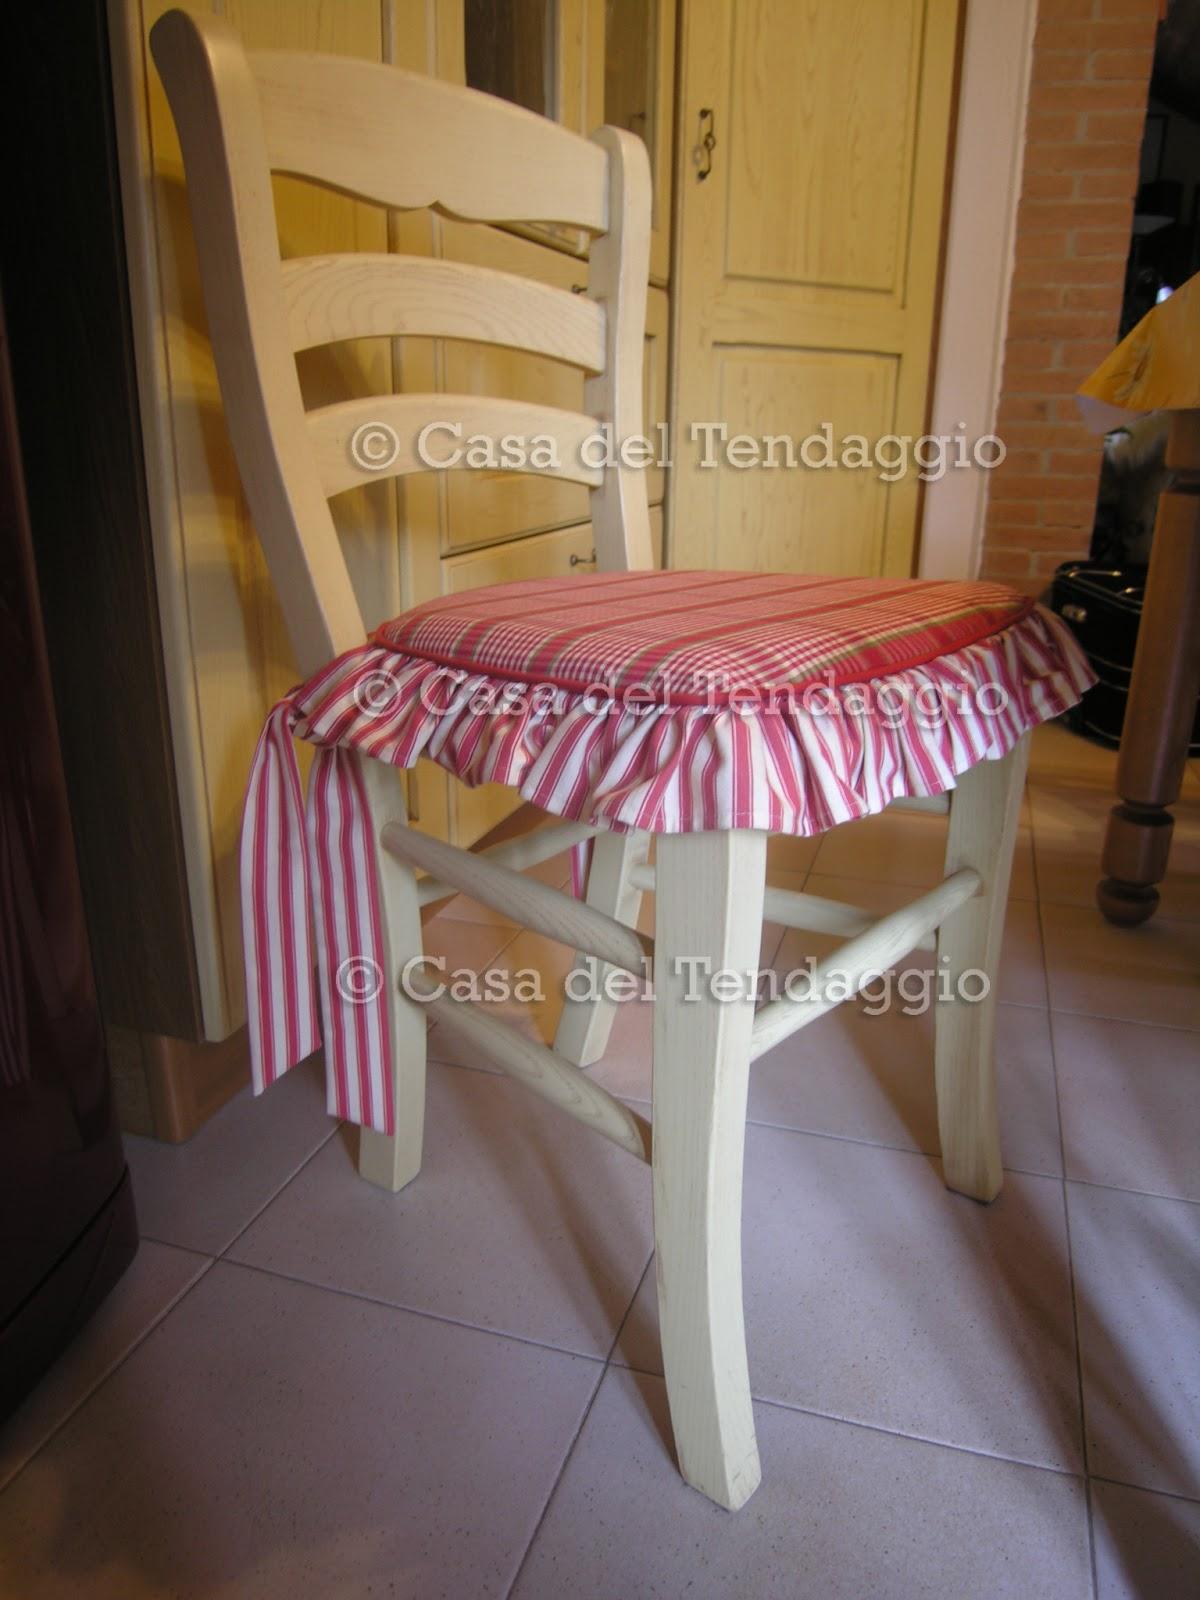 Cuscini per sedie cucina - Shopping Acquea